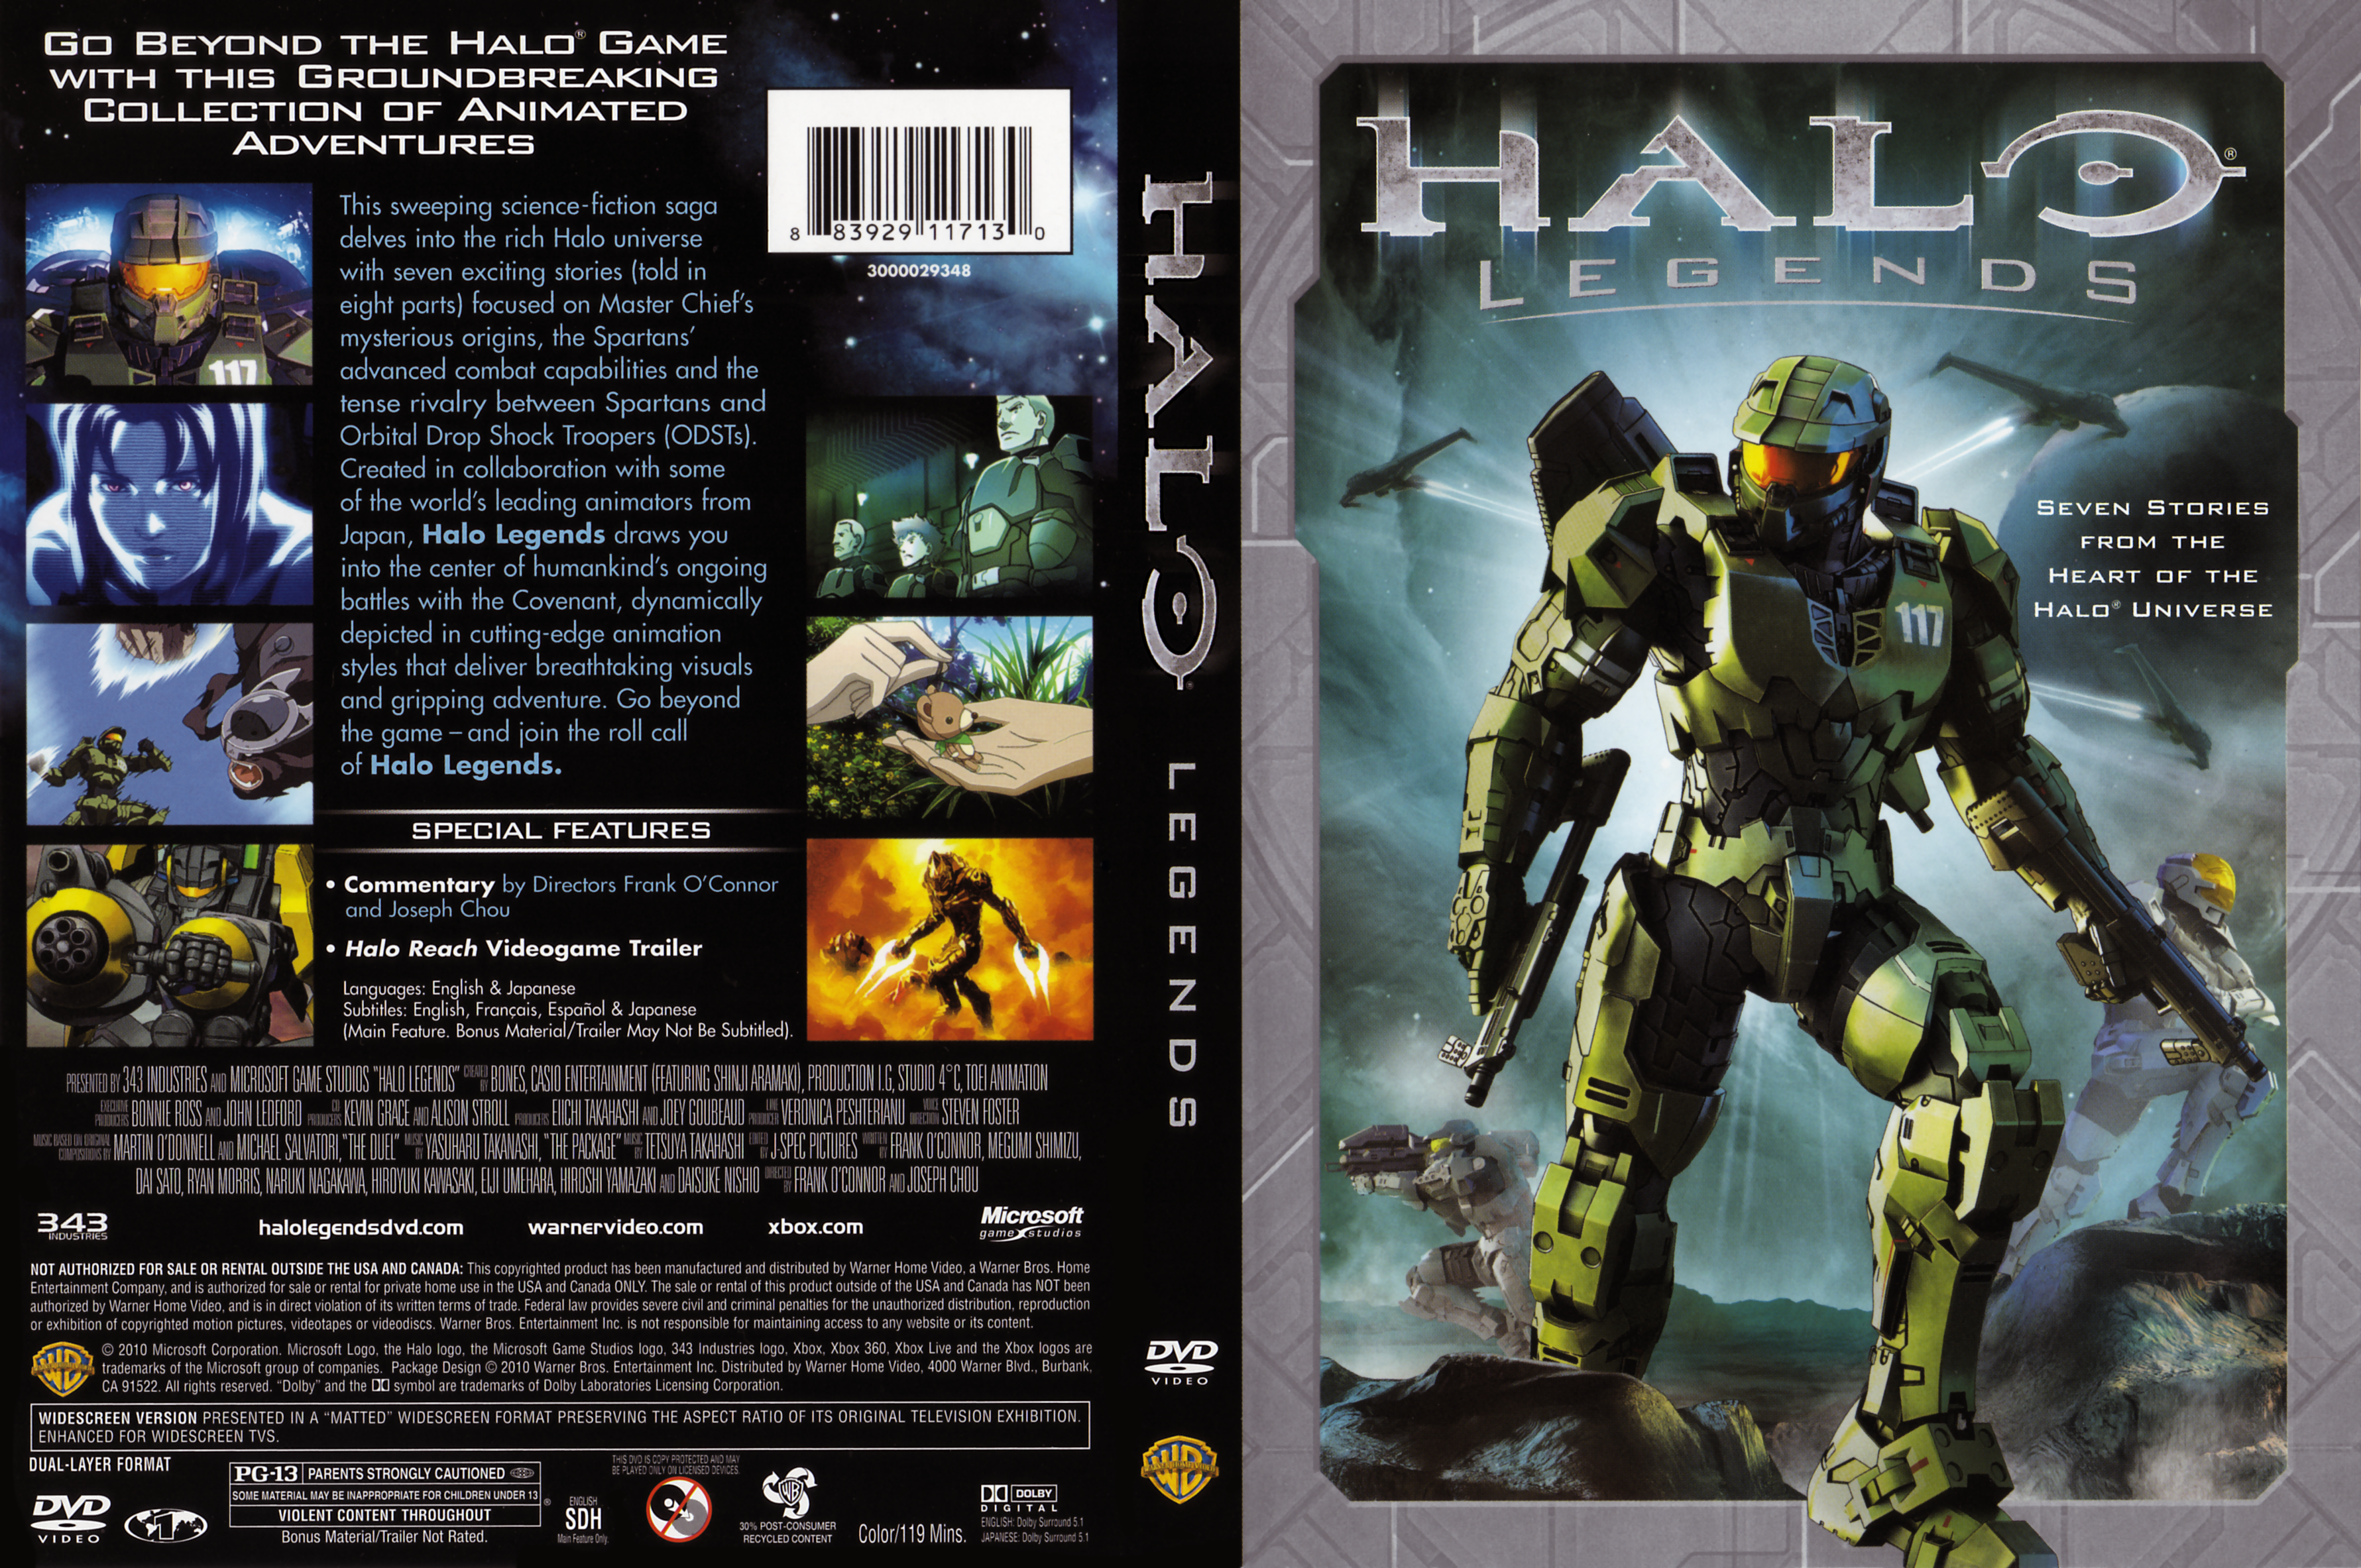 High Resolution Wallpaper | Halo Legends 3562x2366 px